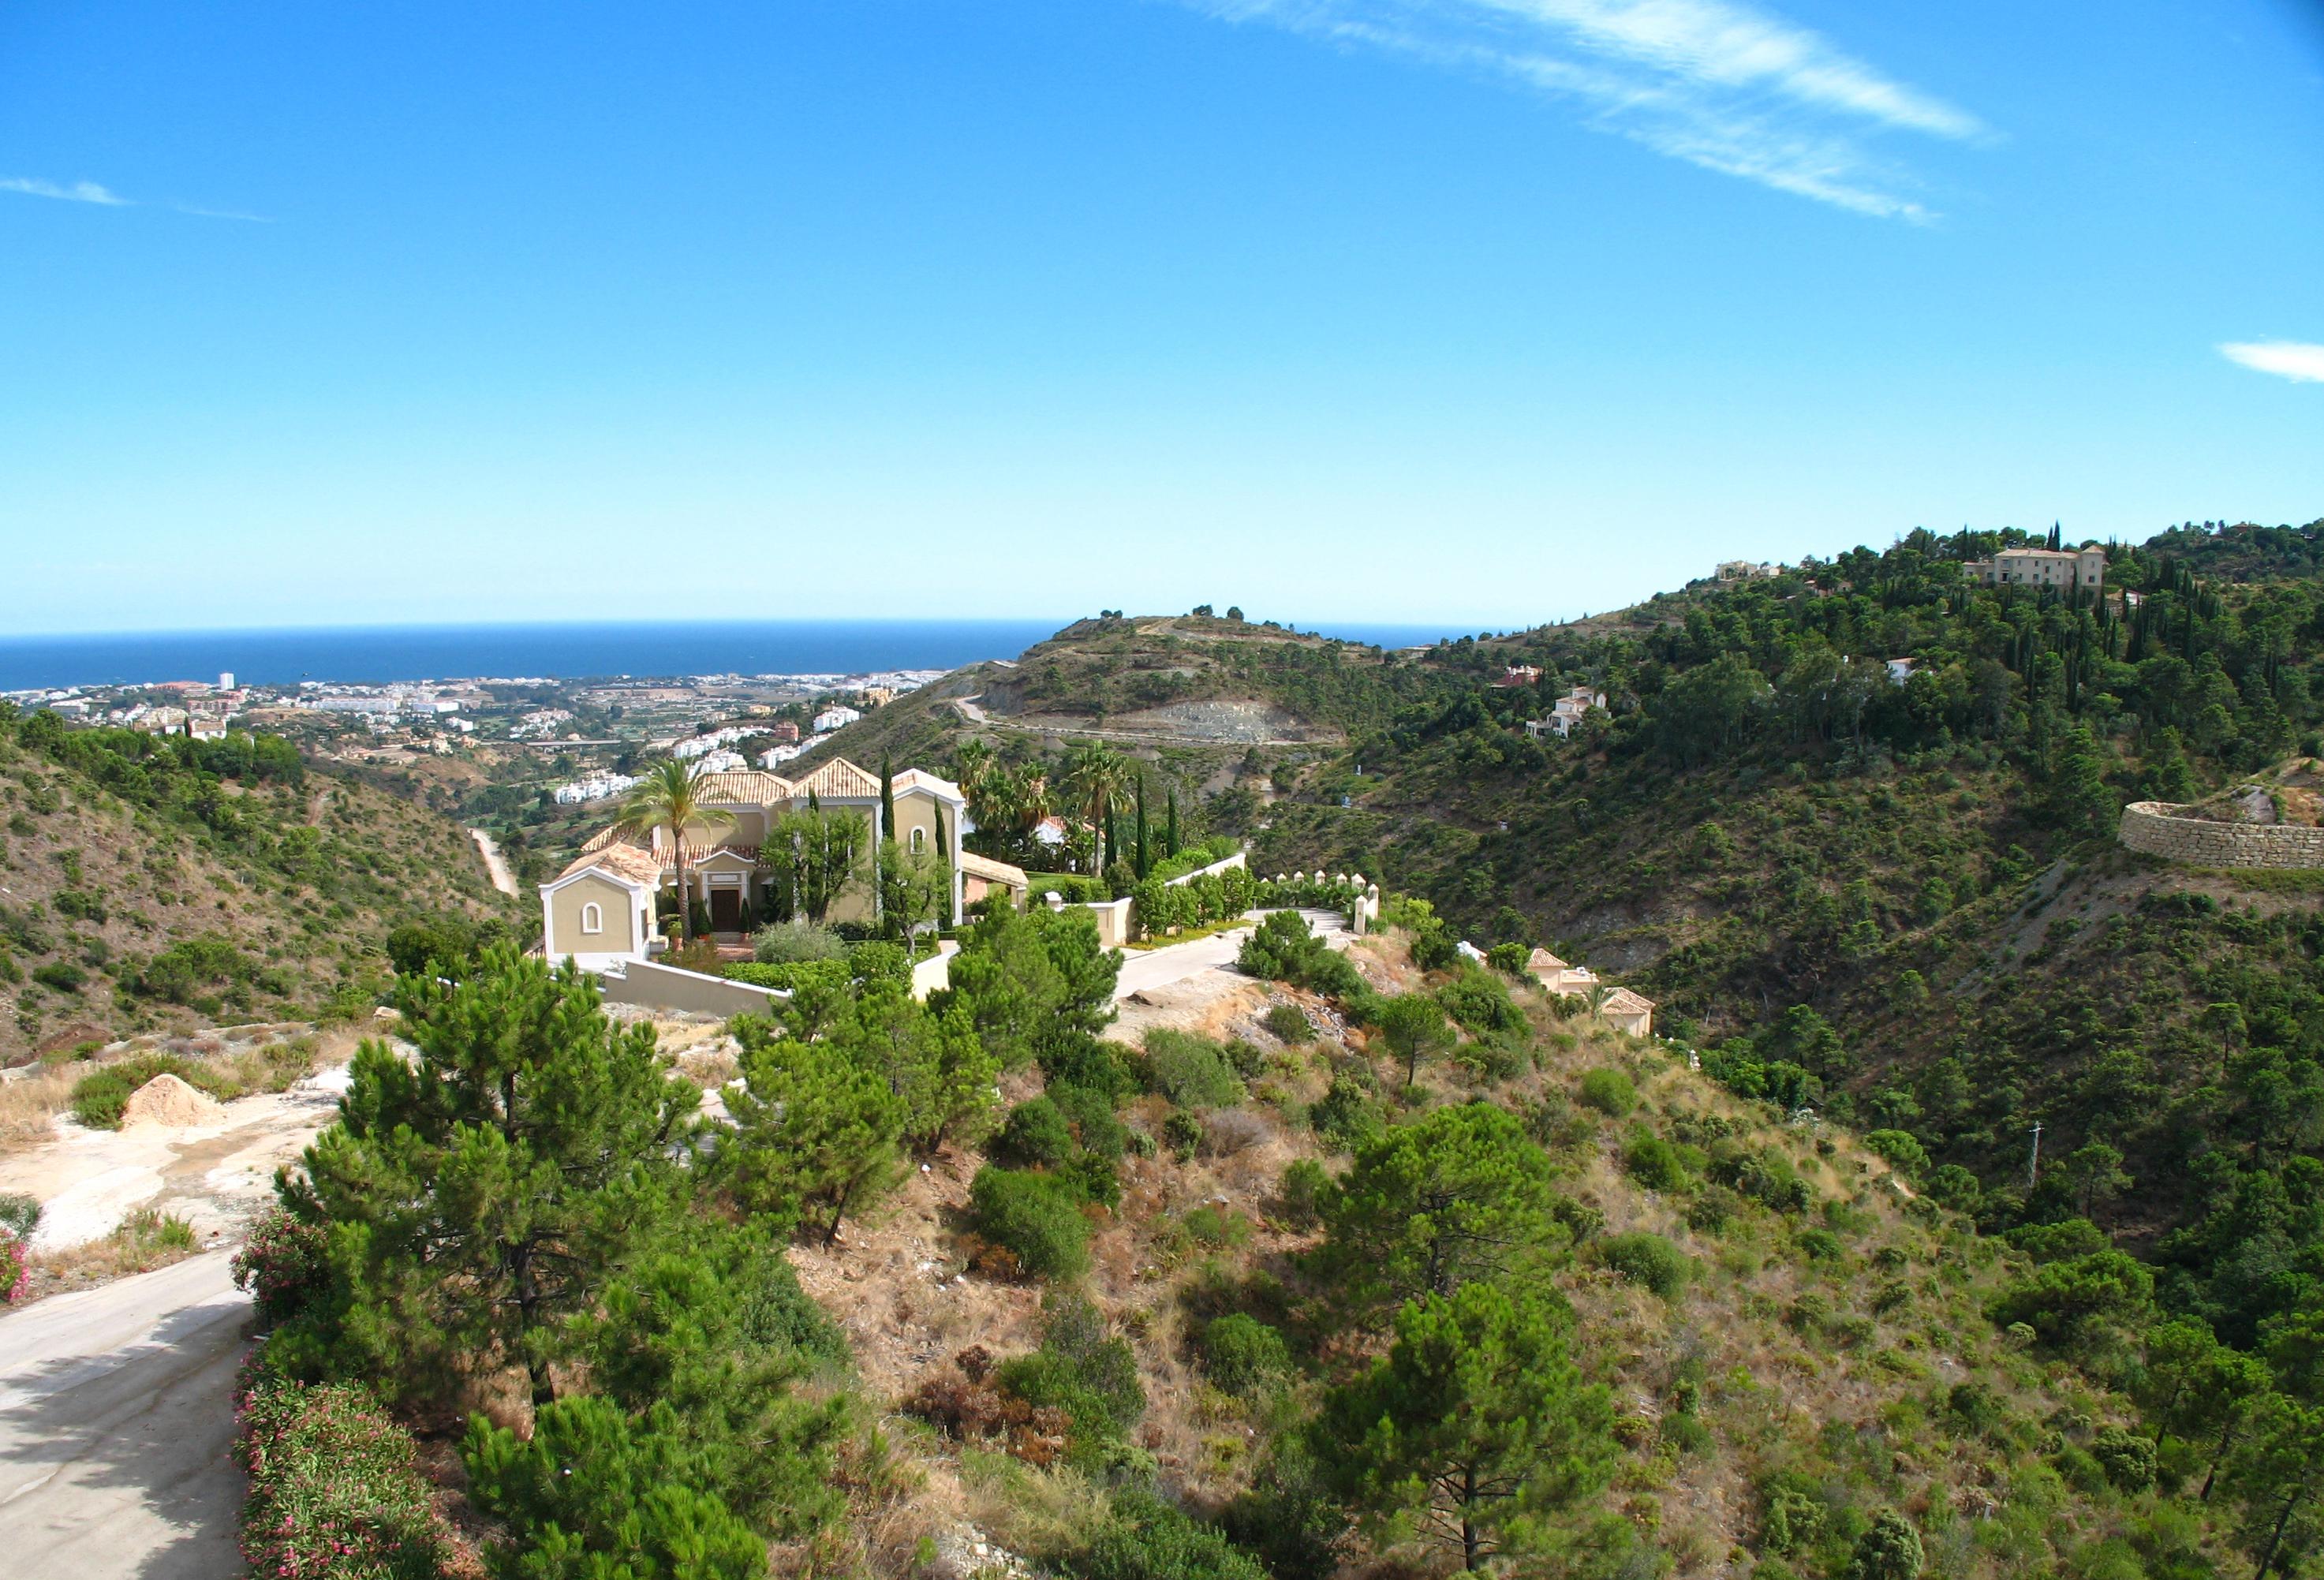 El Madroñal, life in the hills of Marbella